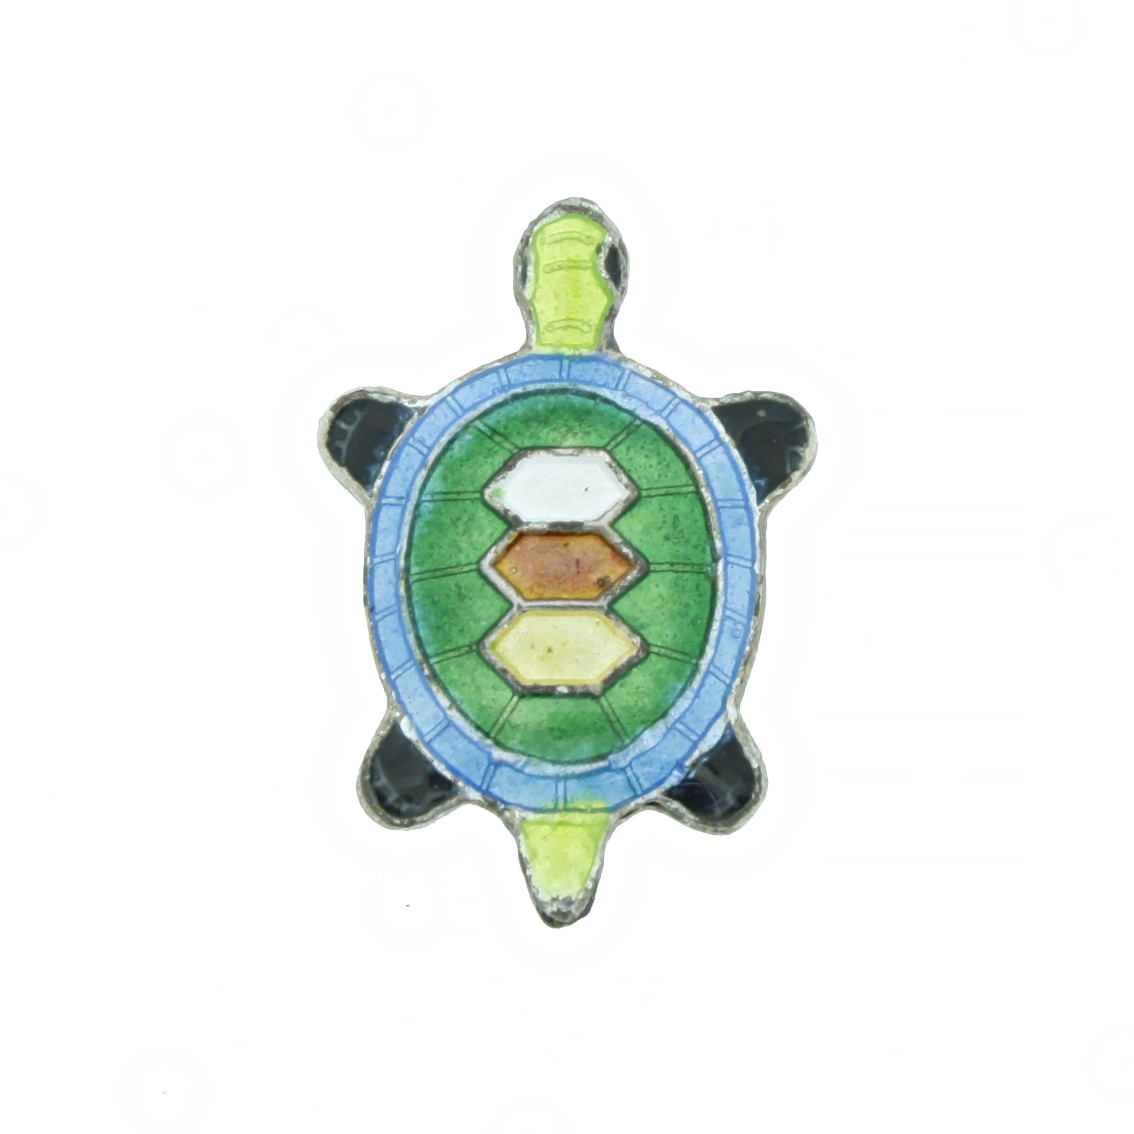 Cloisonné - Entremeio - Tartaruga - Verde  - Universo Religioso® - Artigos de Umbanda e Candomblé